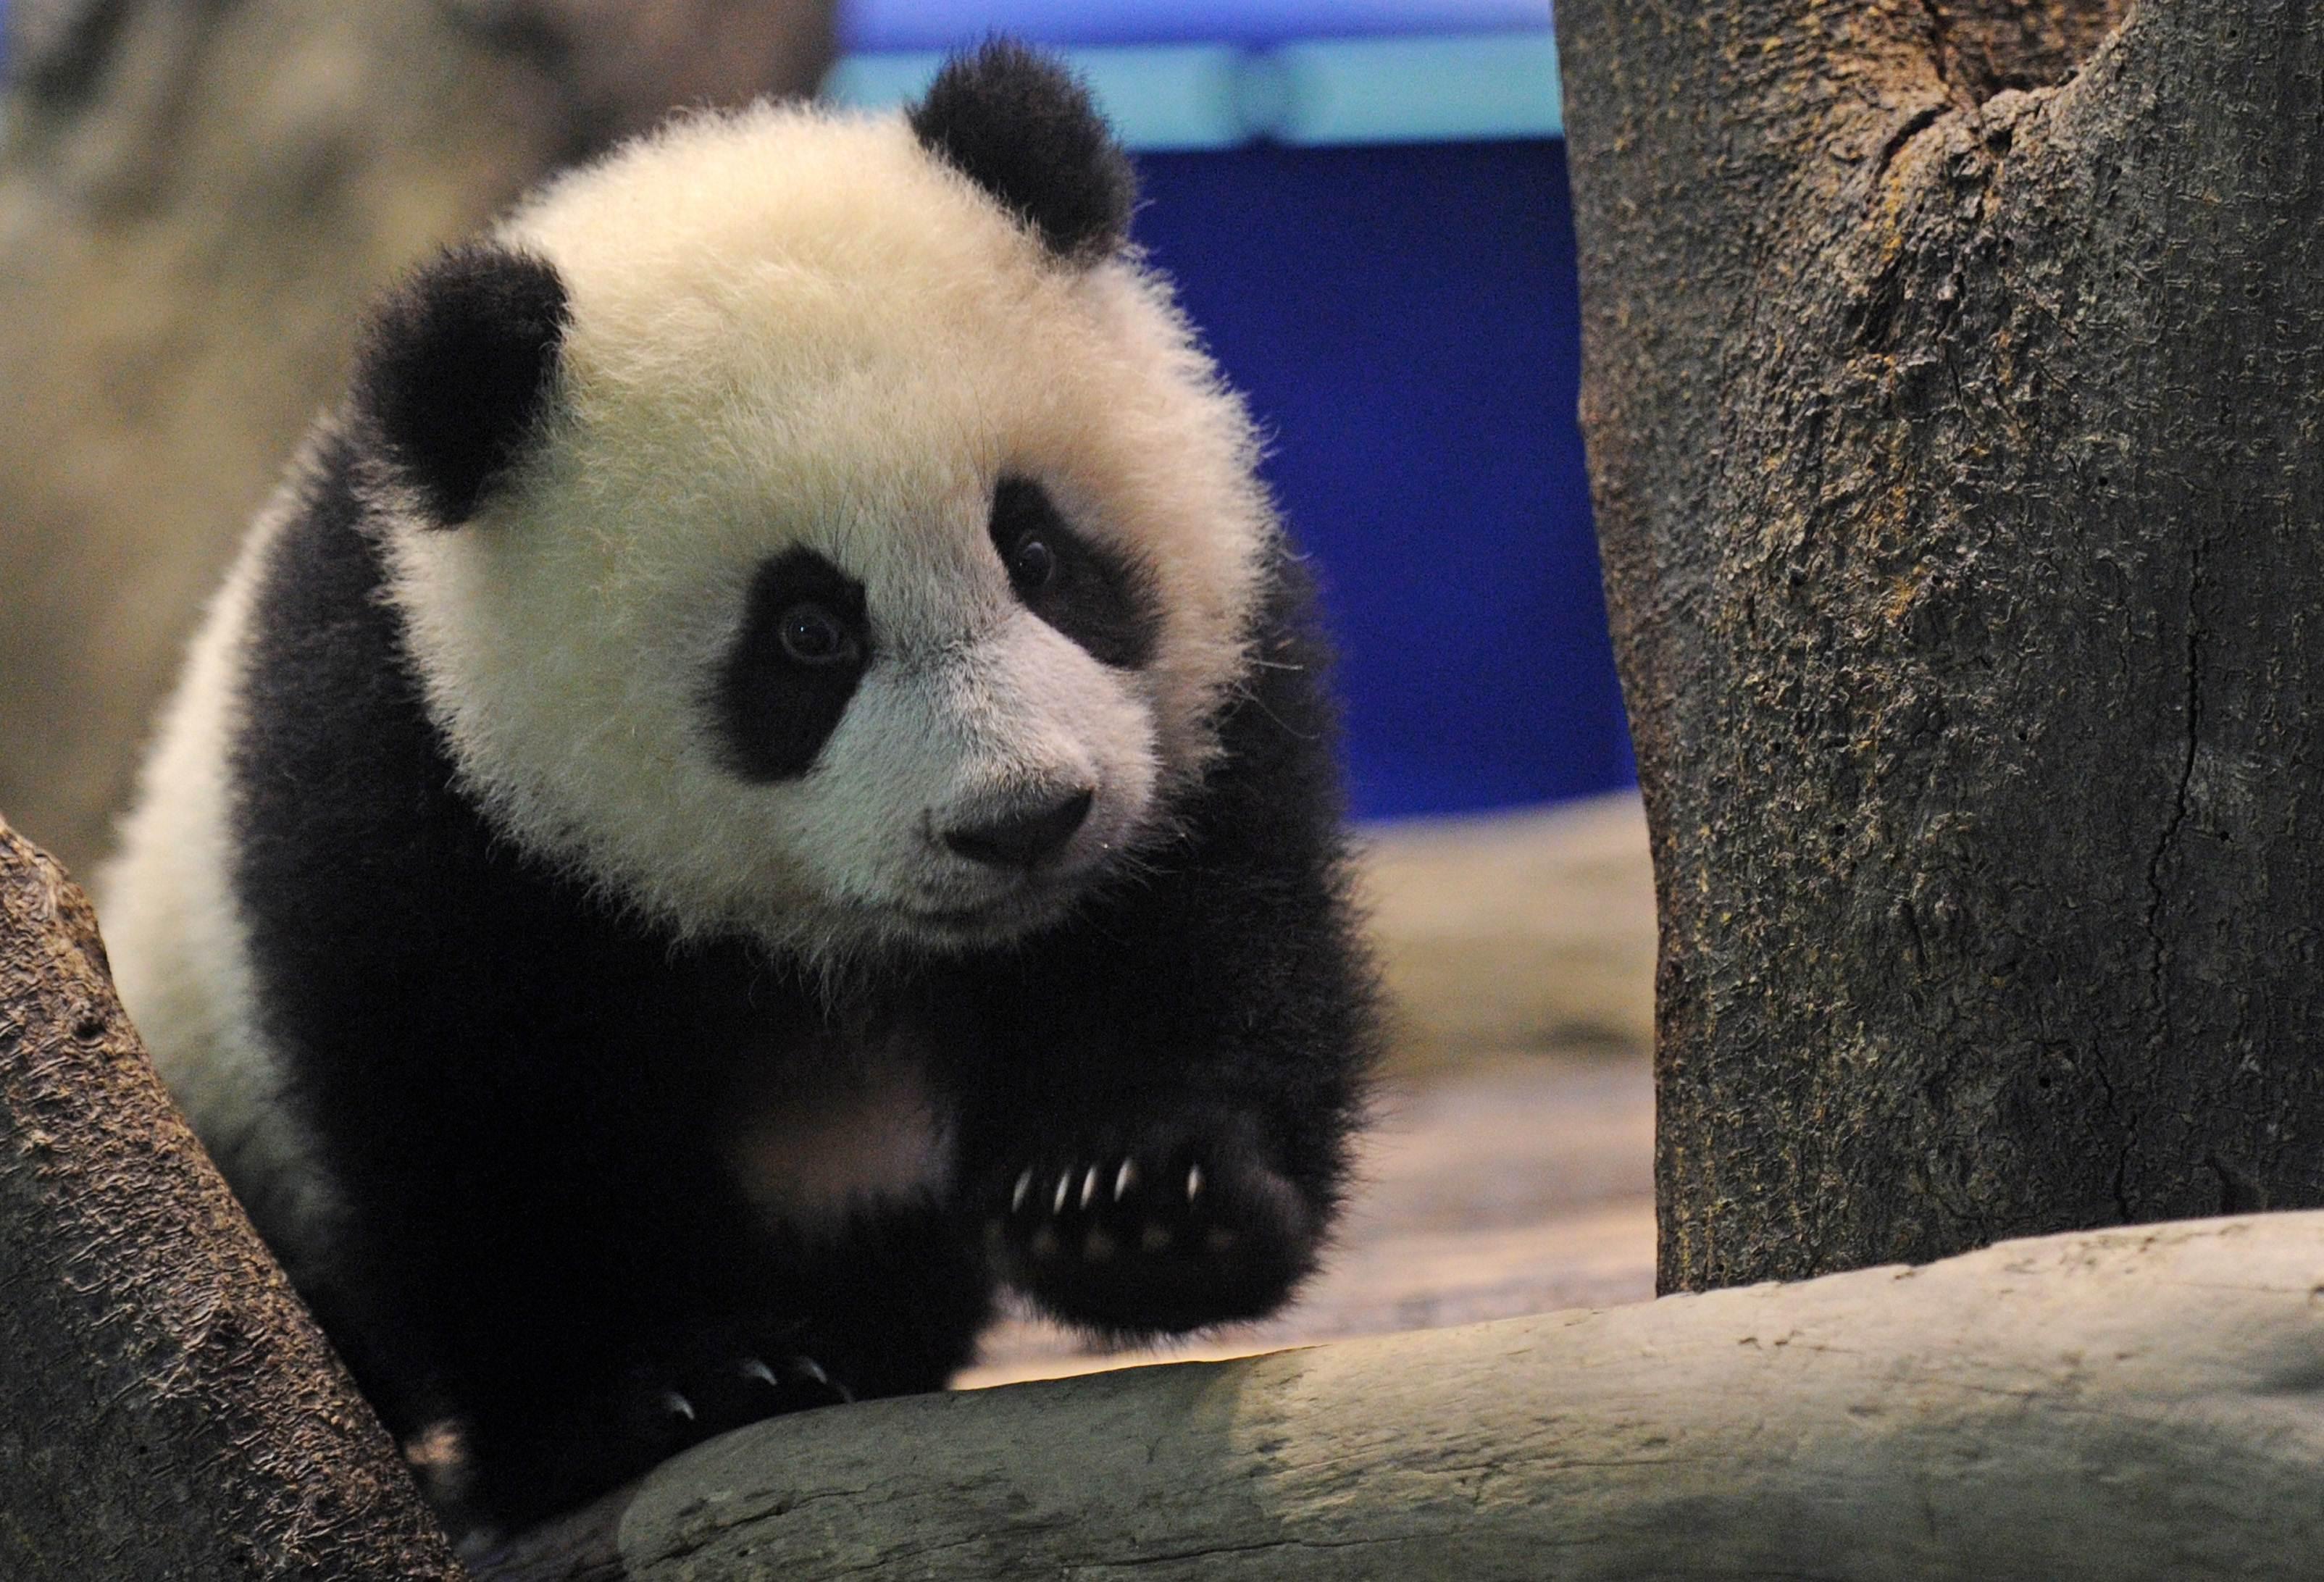 Panda is moving toward the tree